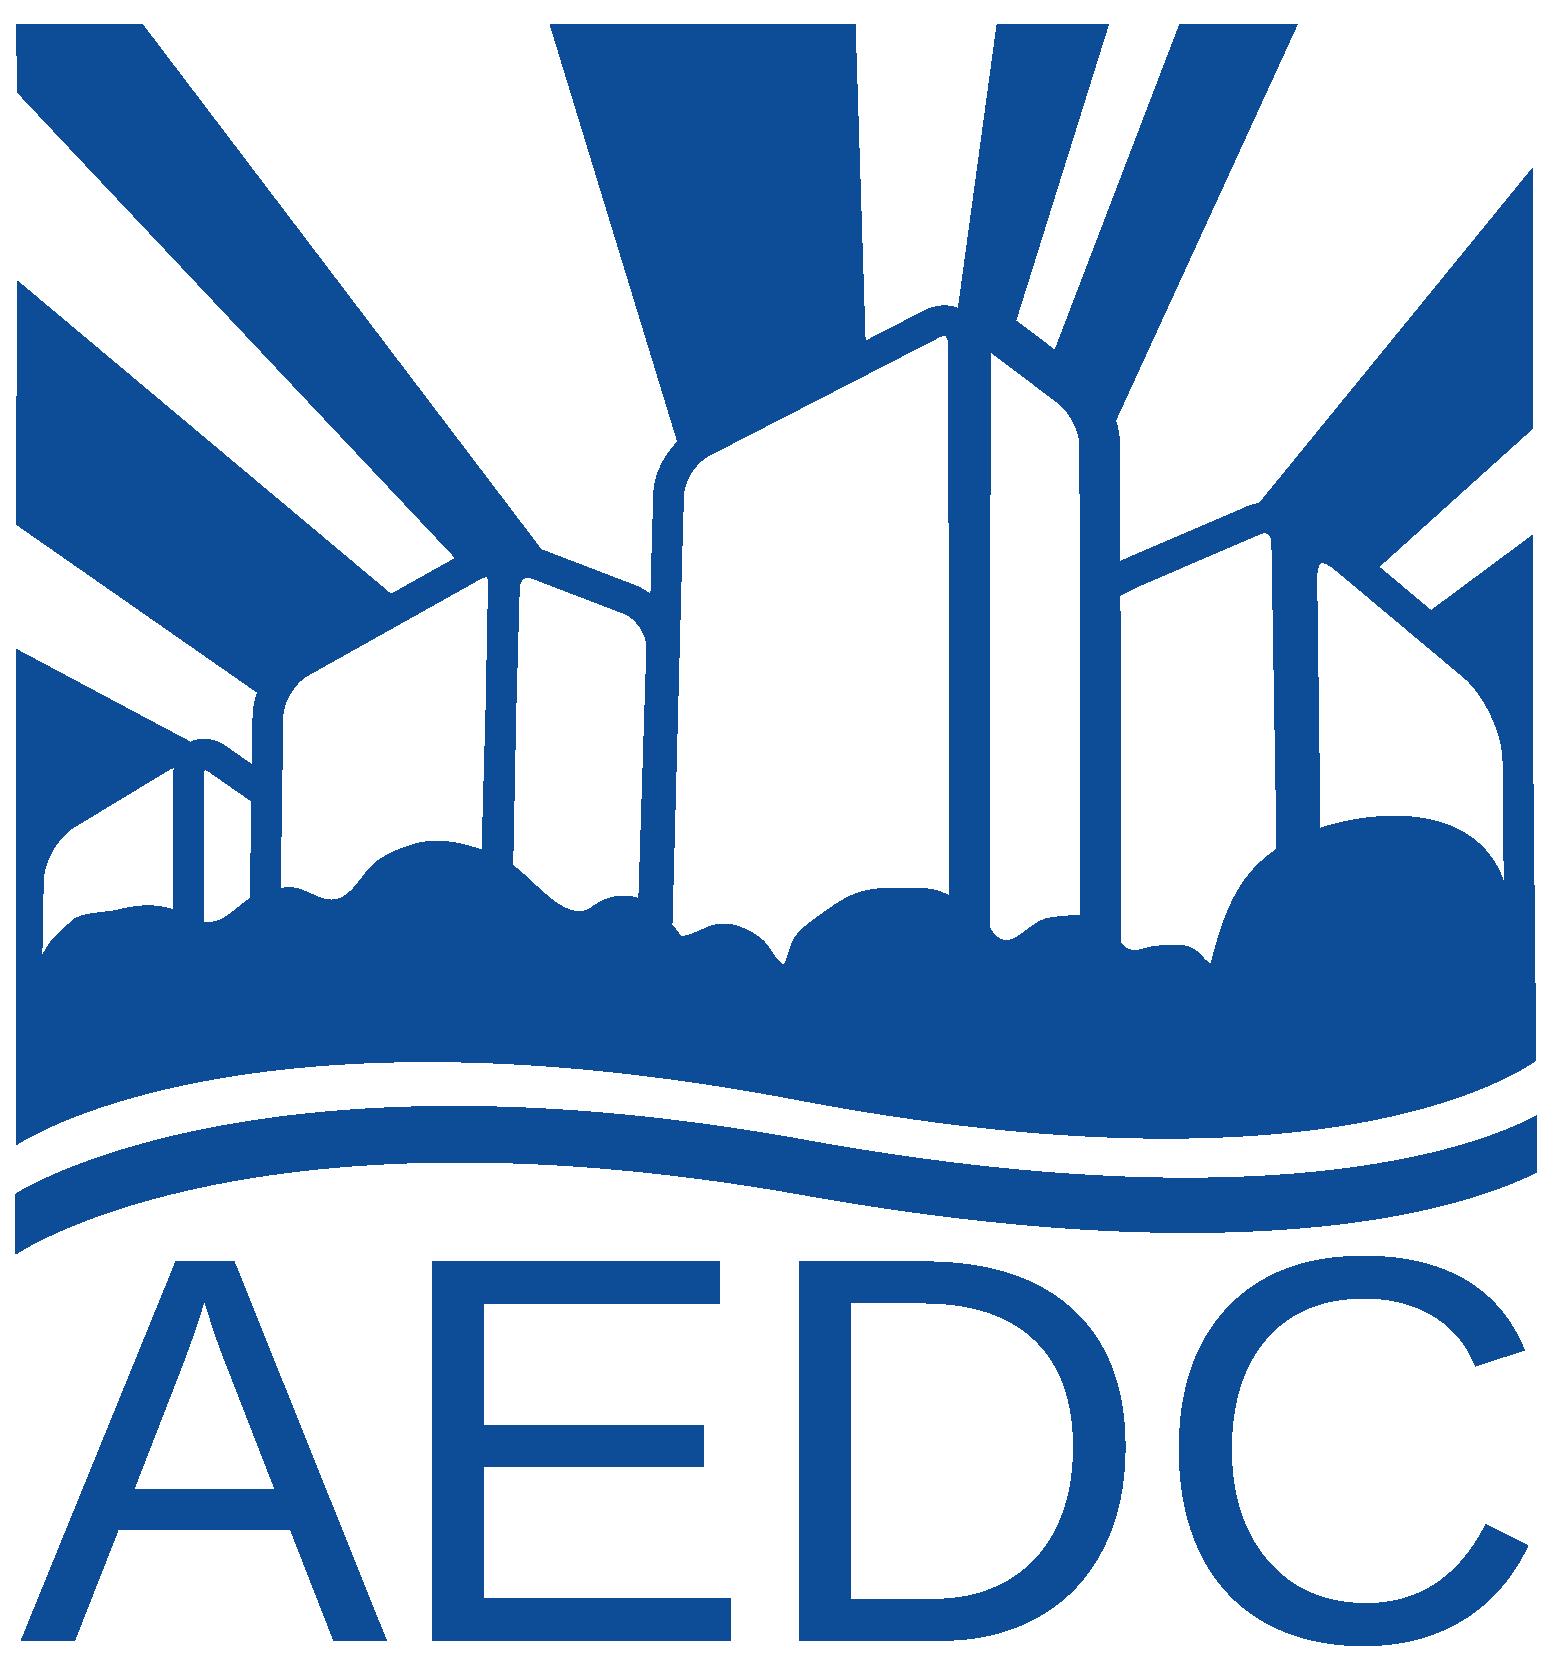 AEDC Division Logos_AEDC Logo.png